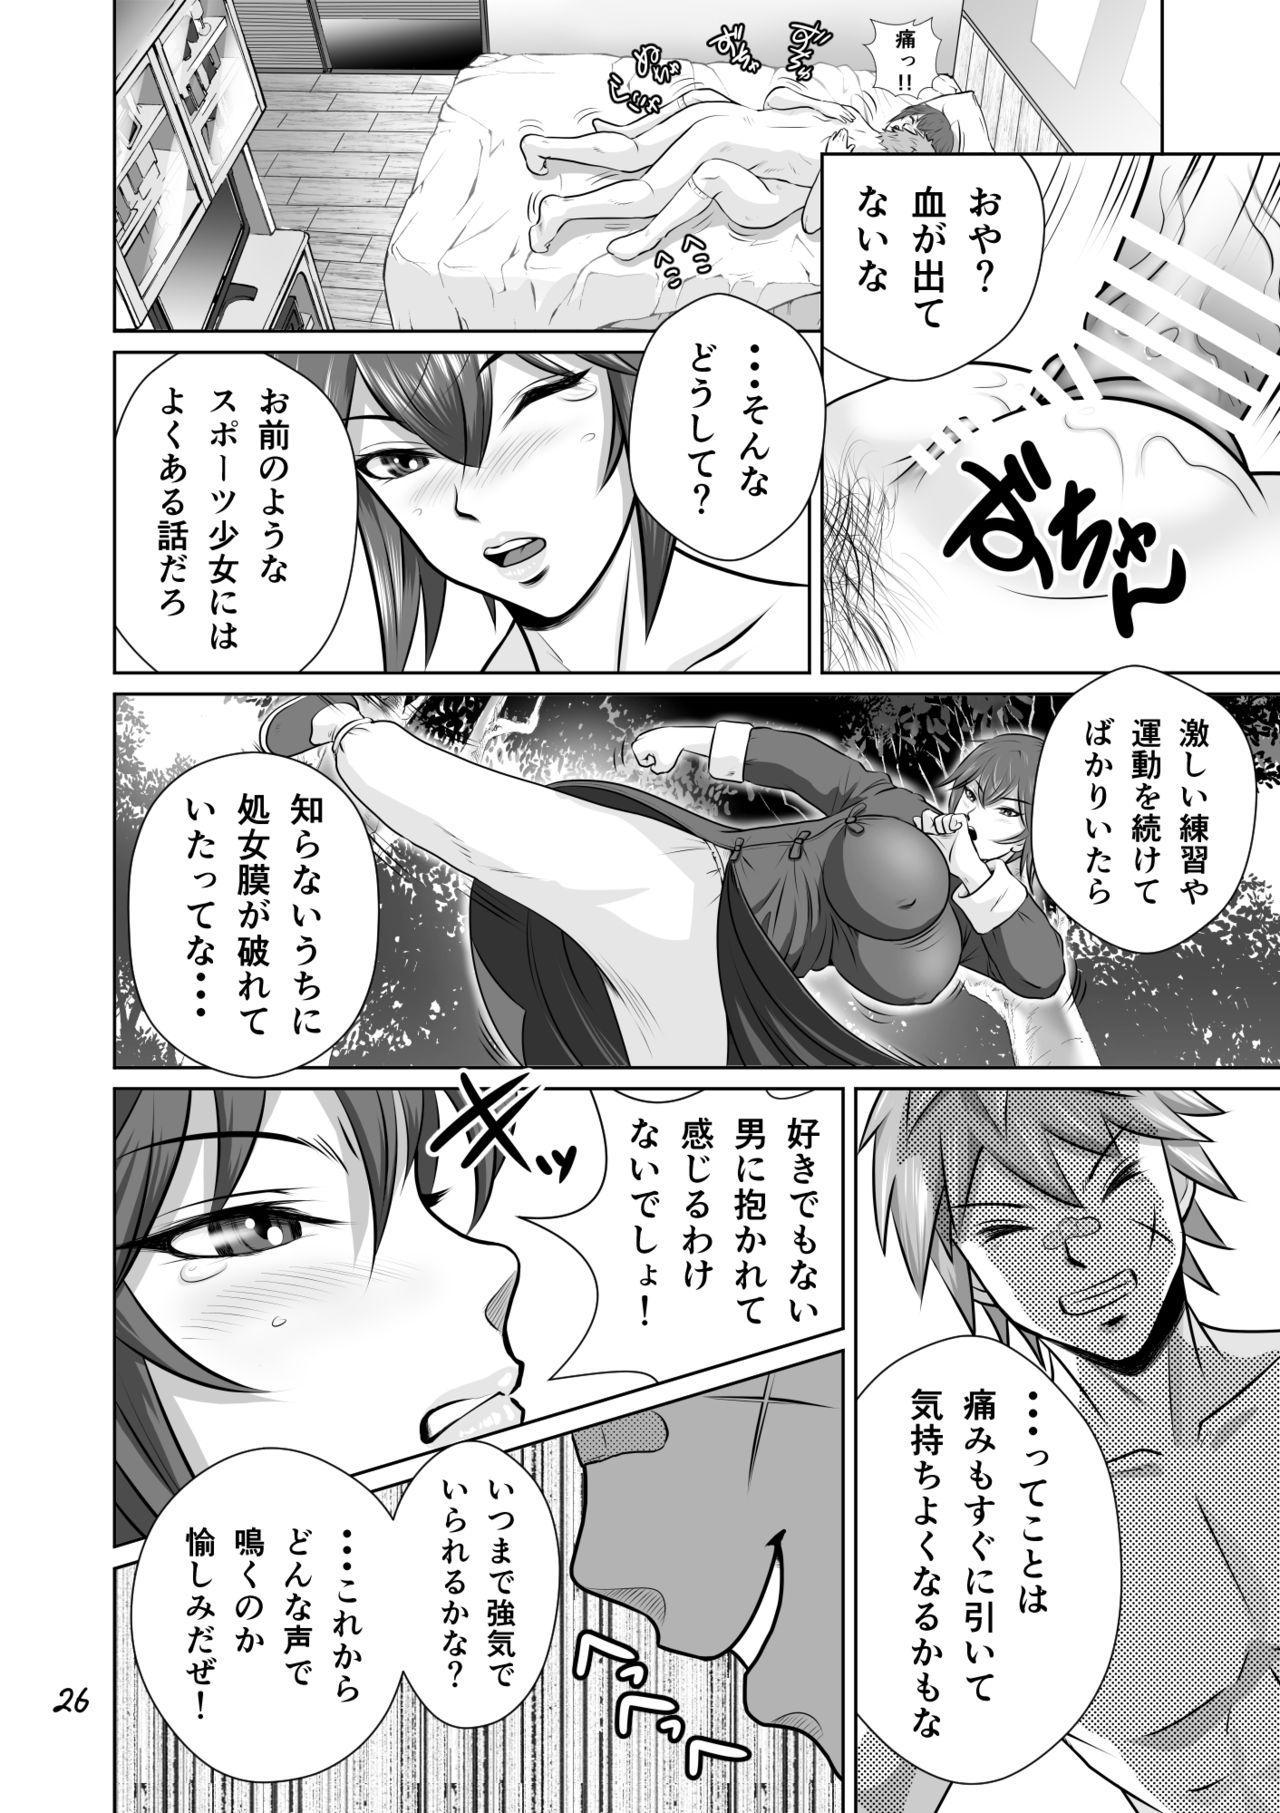 Netorare Osananajimi Haruka-chan Kiki Ippatsu!! 26